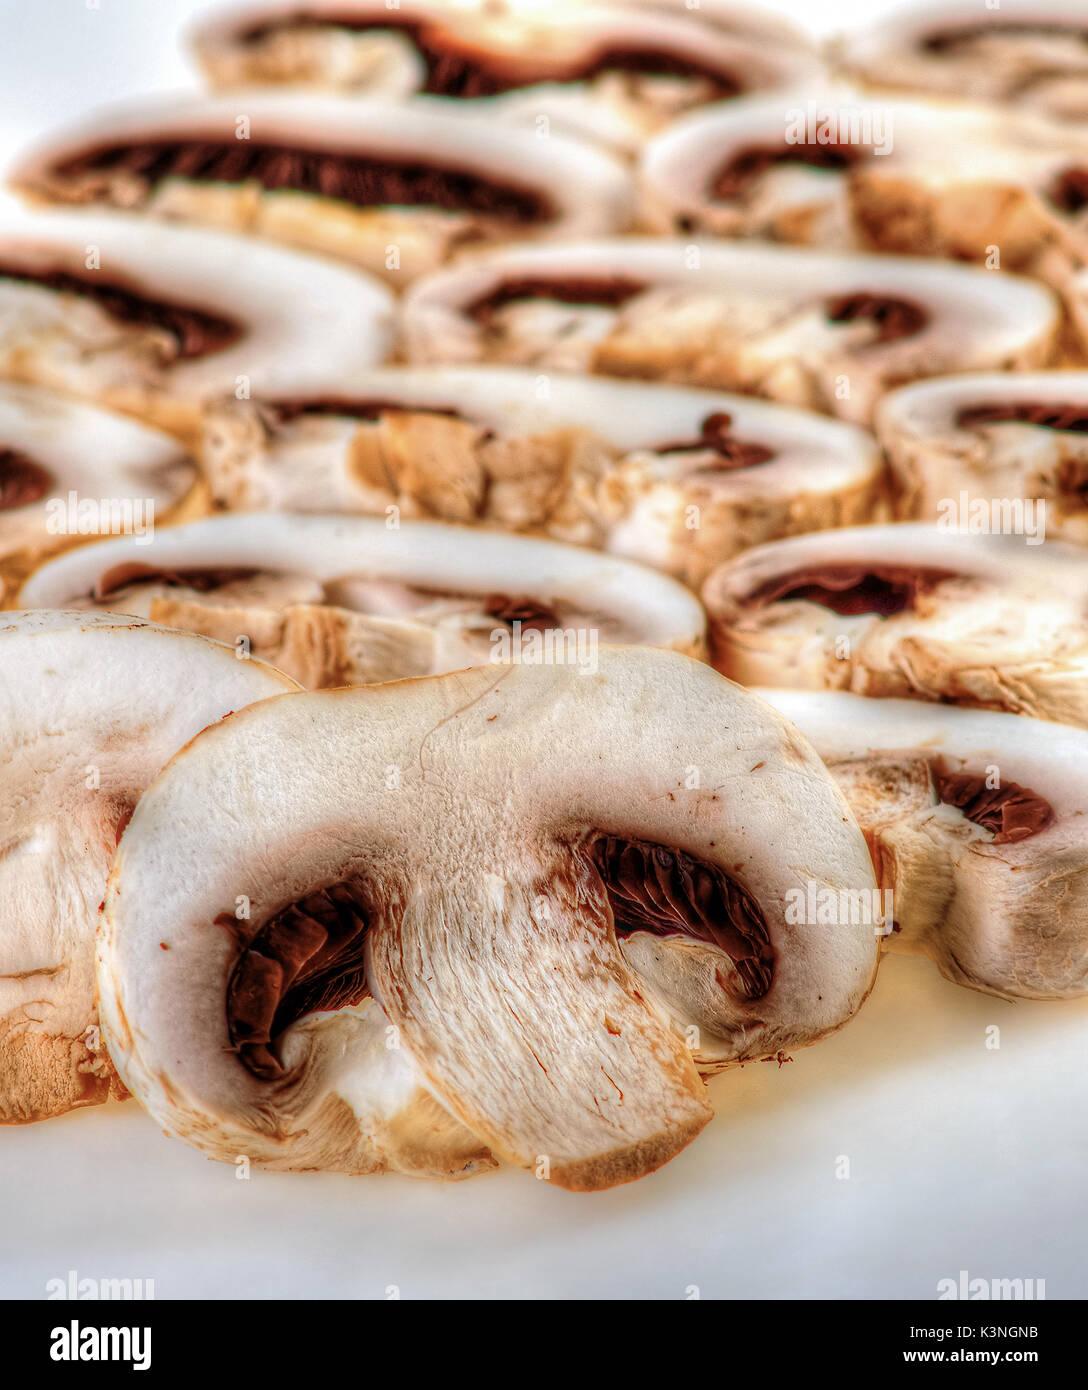 Fresh sliced mushrooms for food ingredient - Stock Image